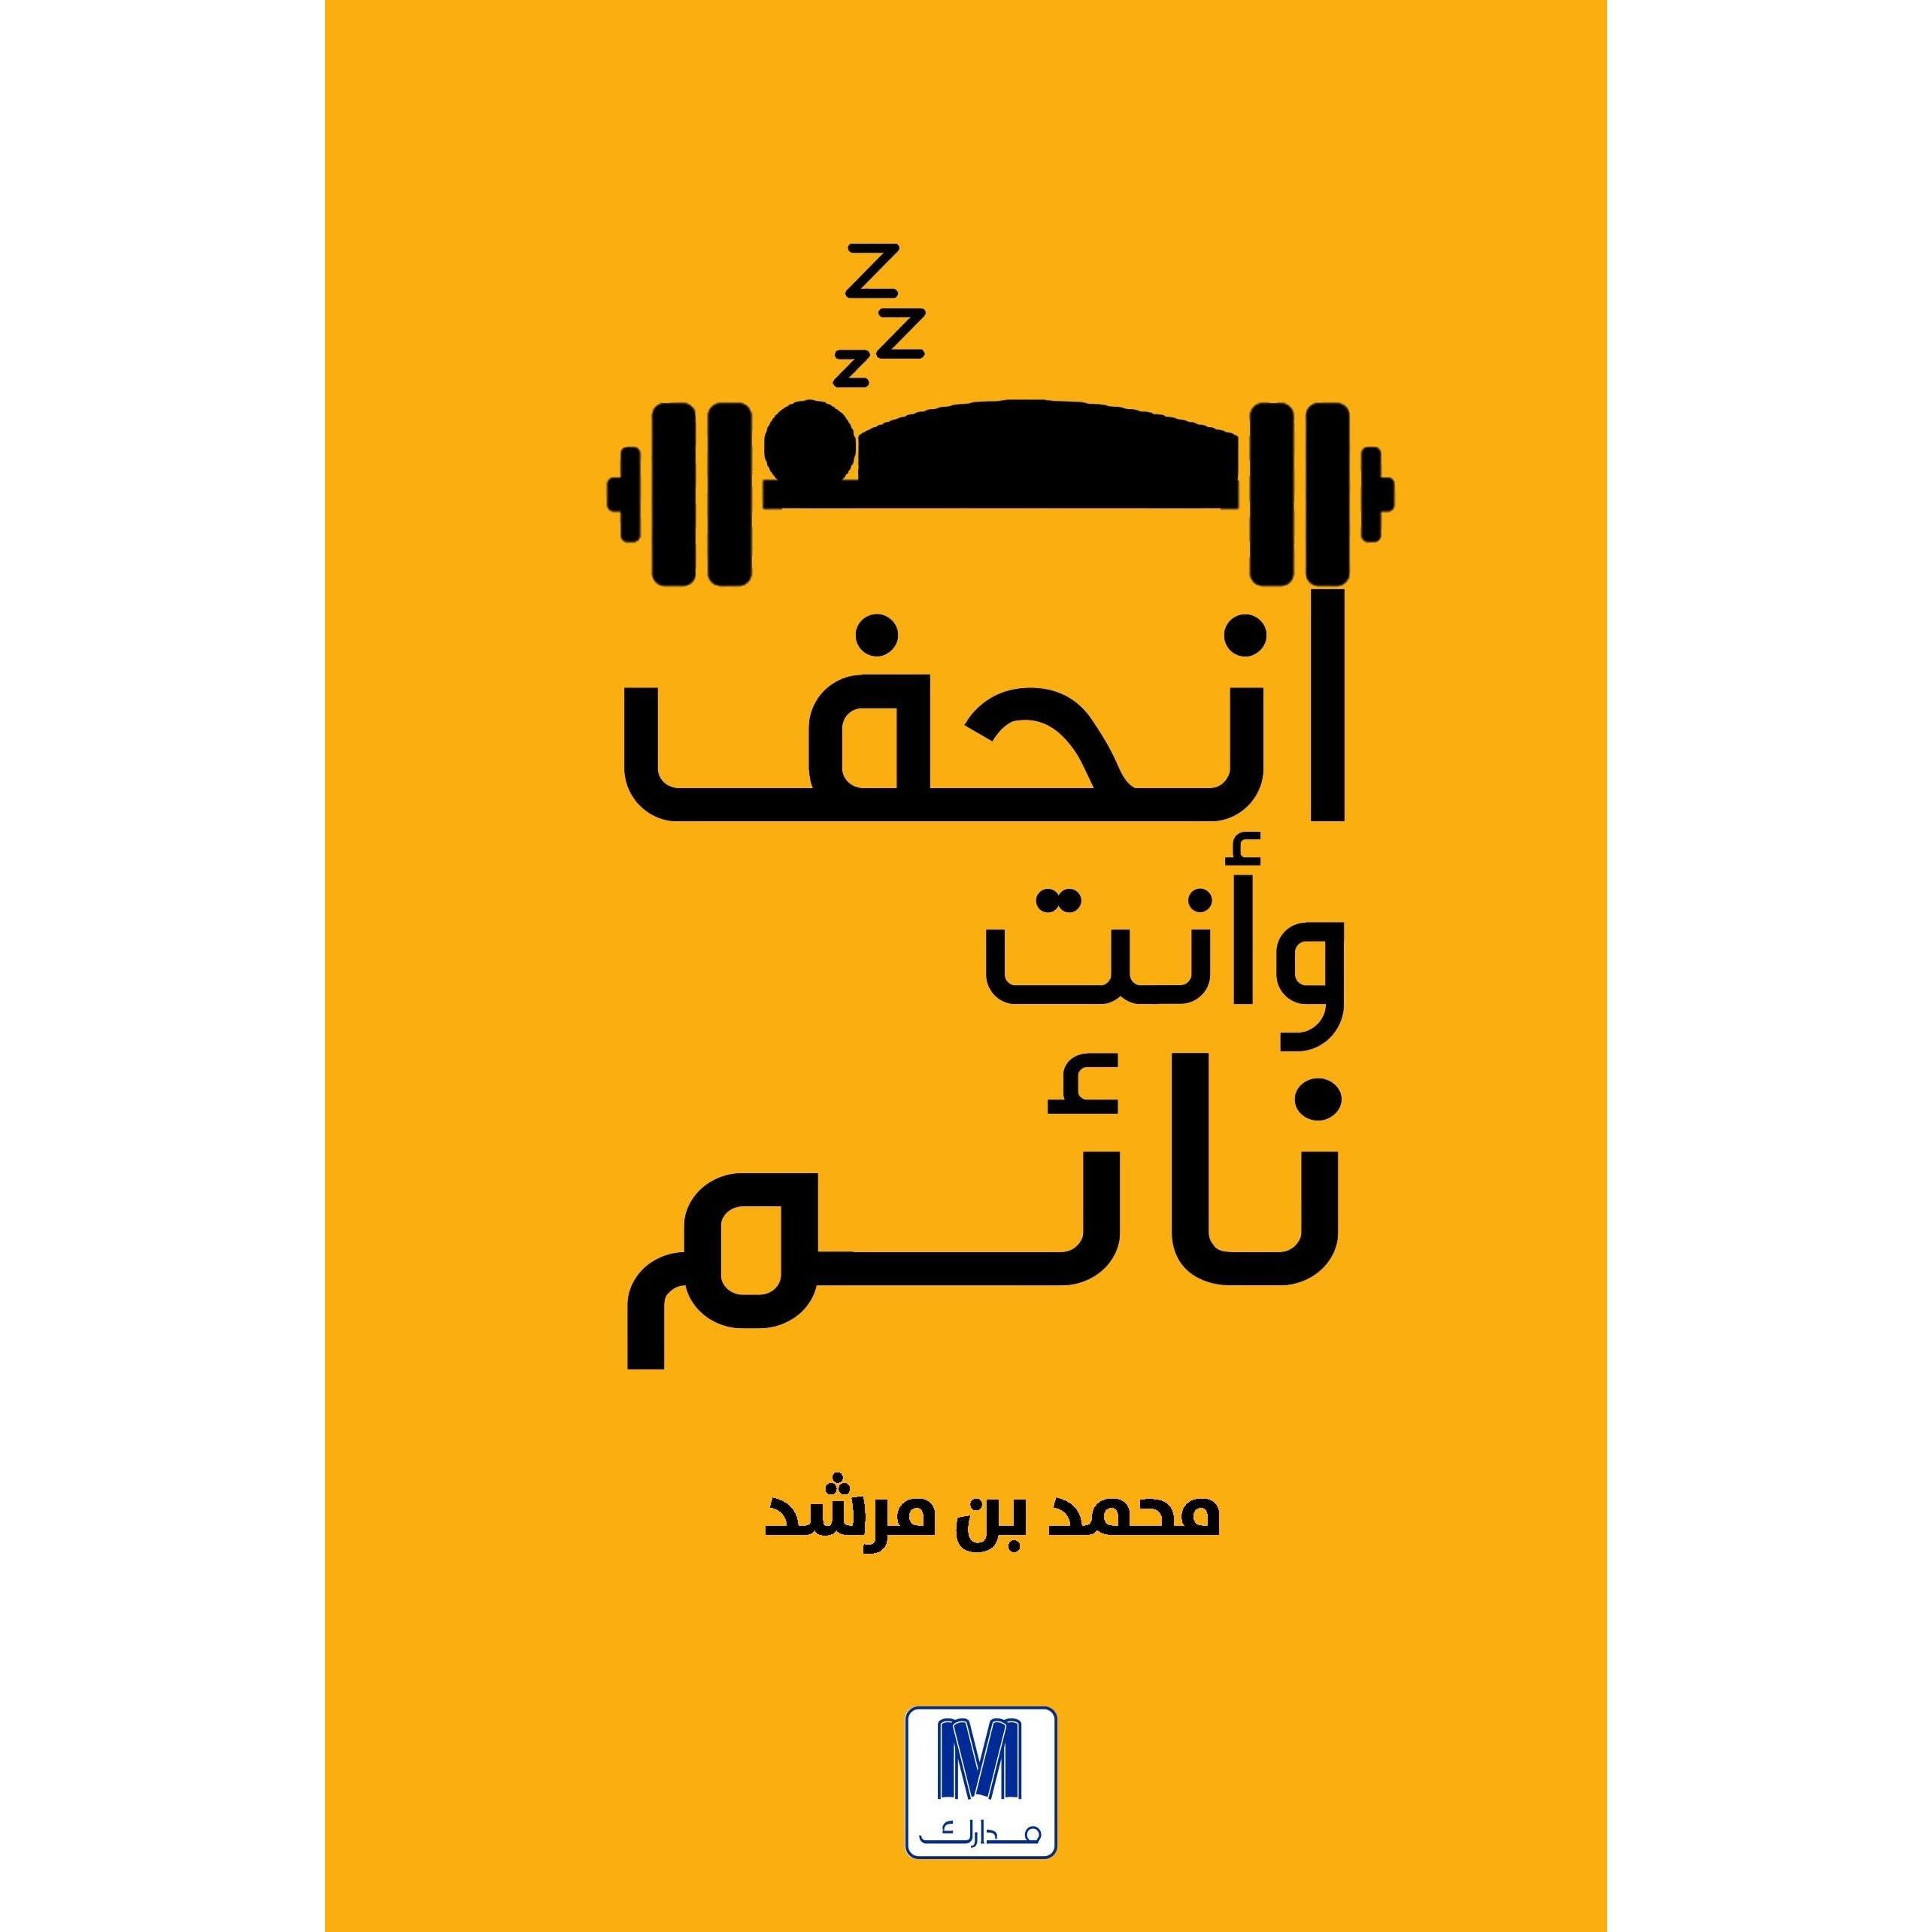 انحف وأنت نائم by محمد بن مرشد